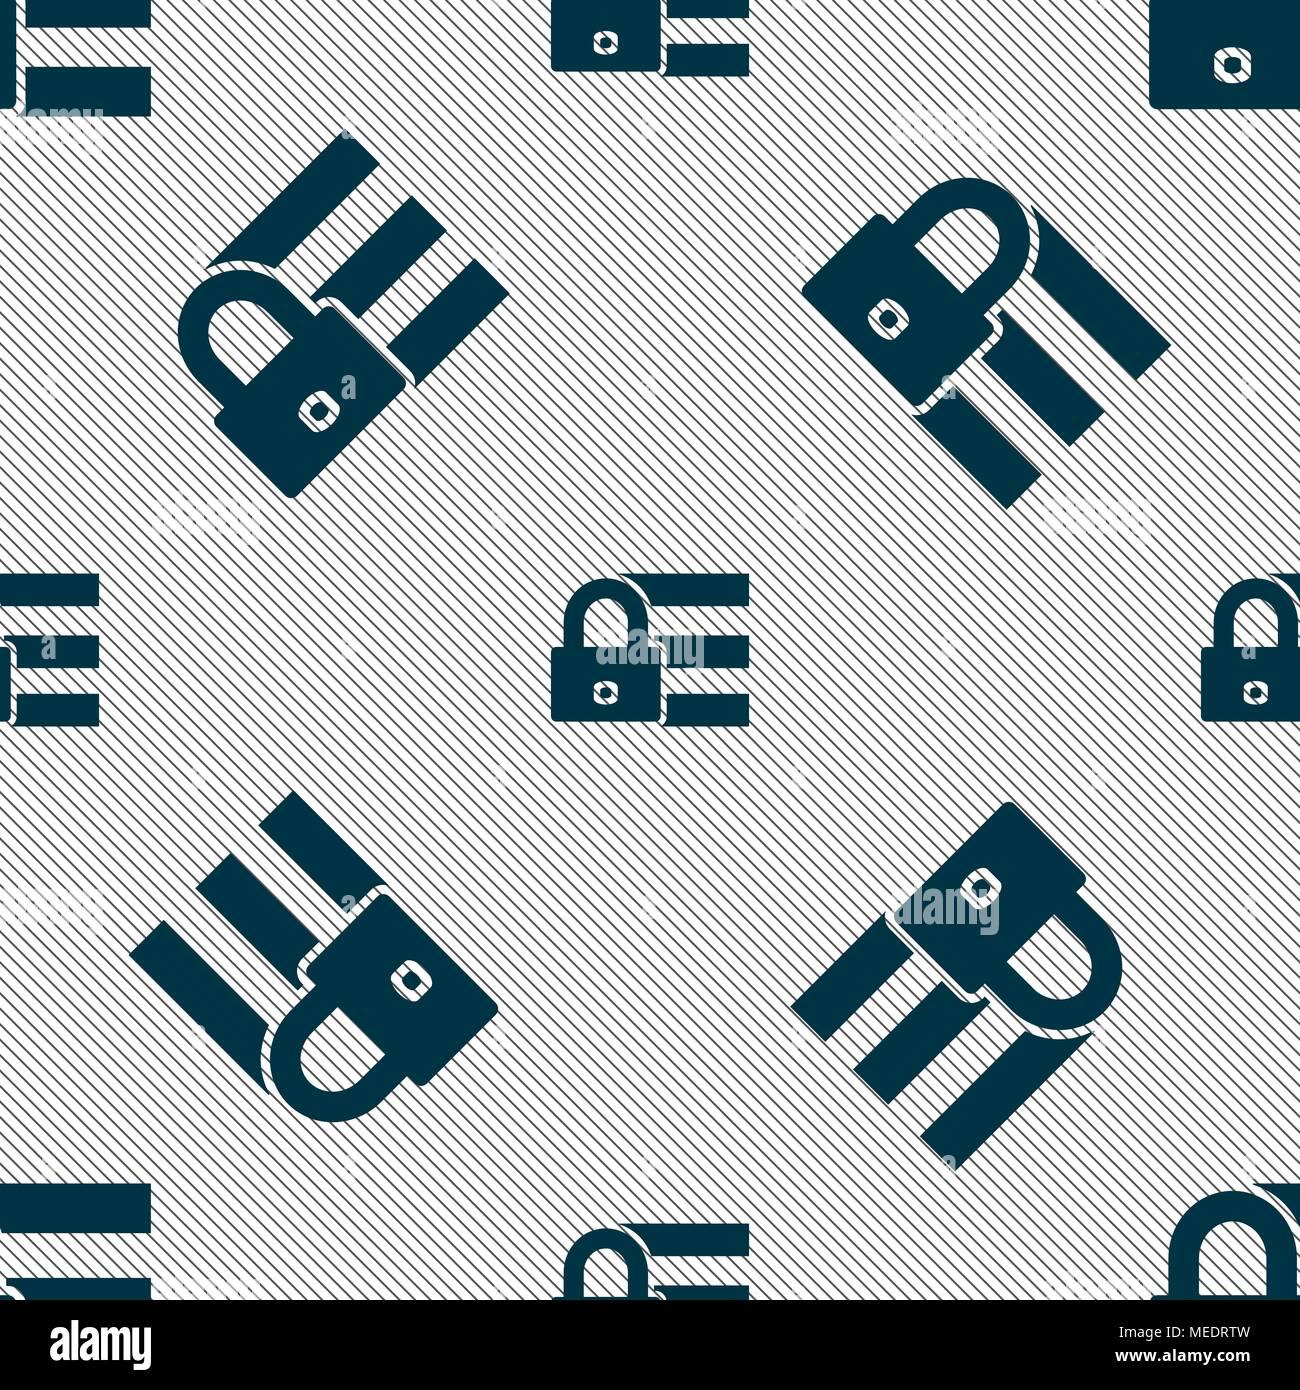 Lock, login icon sign  Seamless pattern with geometric